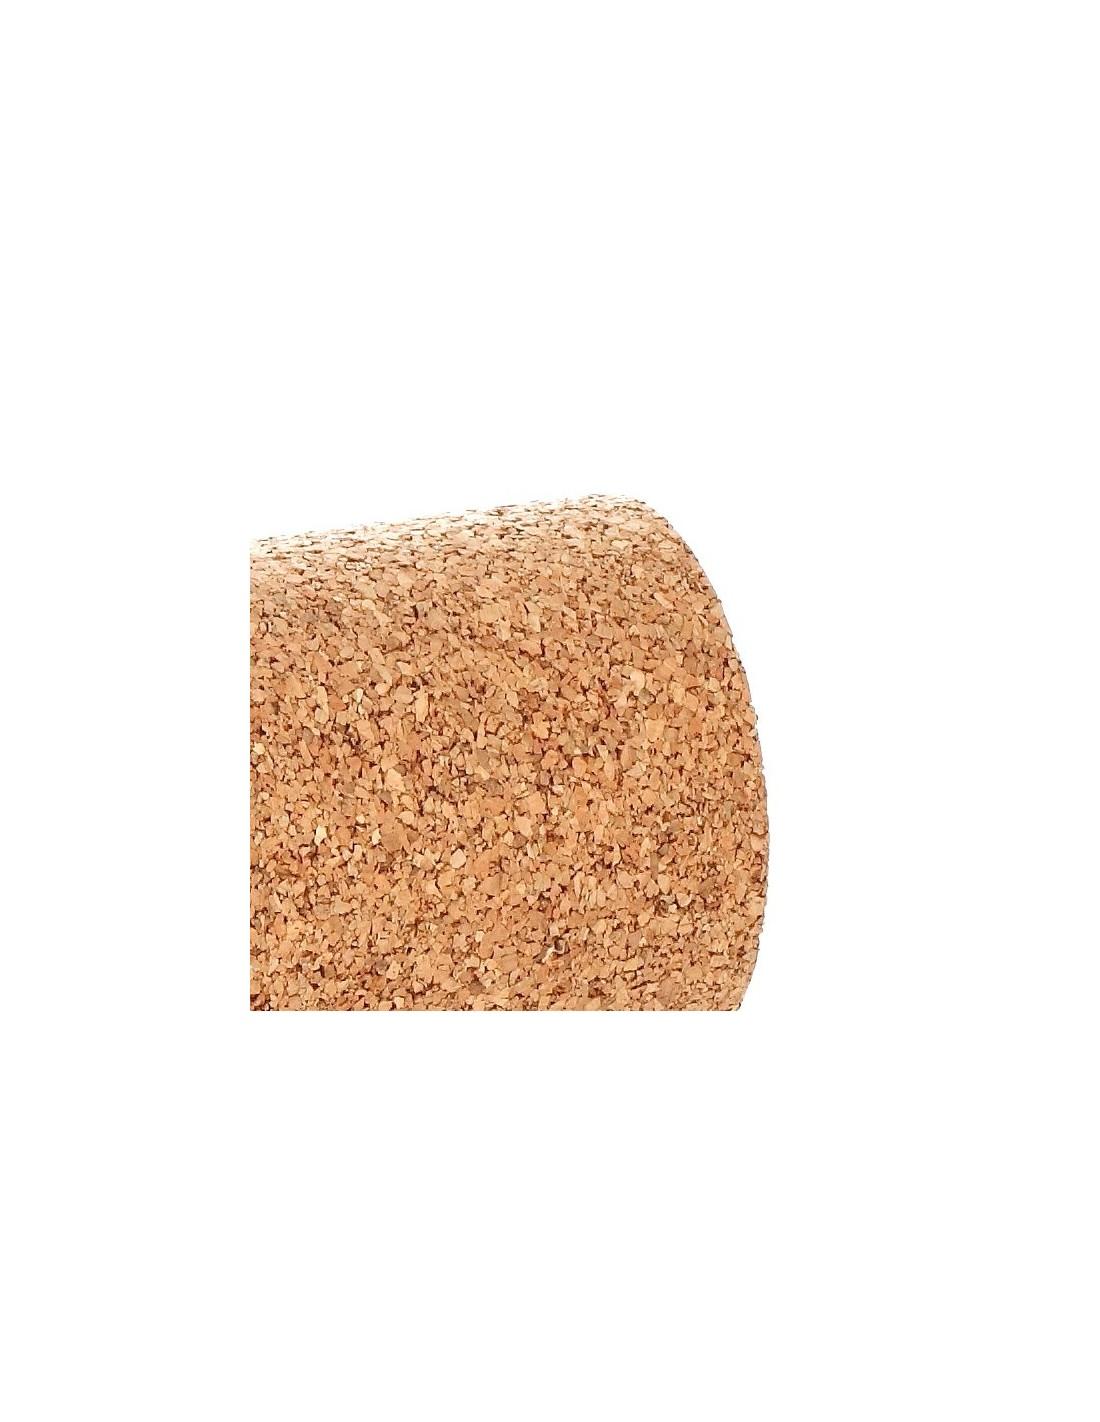 Rollo aislante termico simple detalle del rollo de corcho - Corcho aislante termico ...